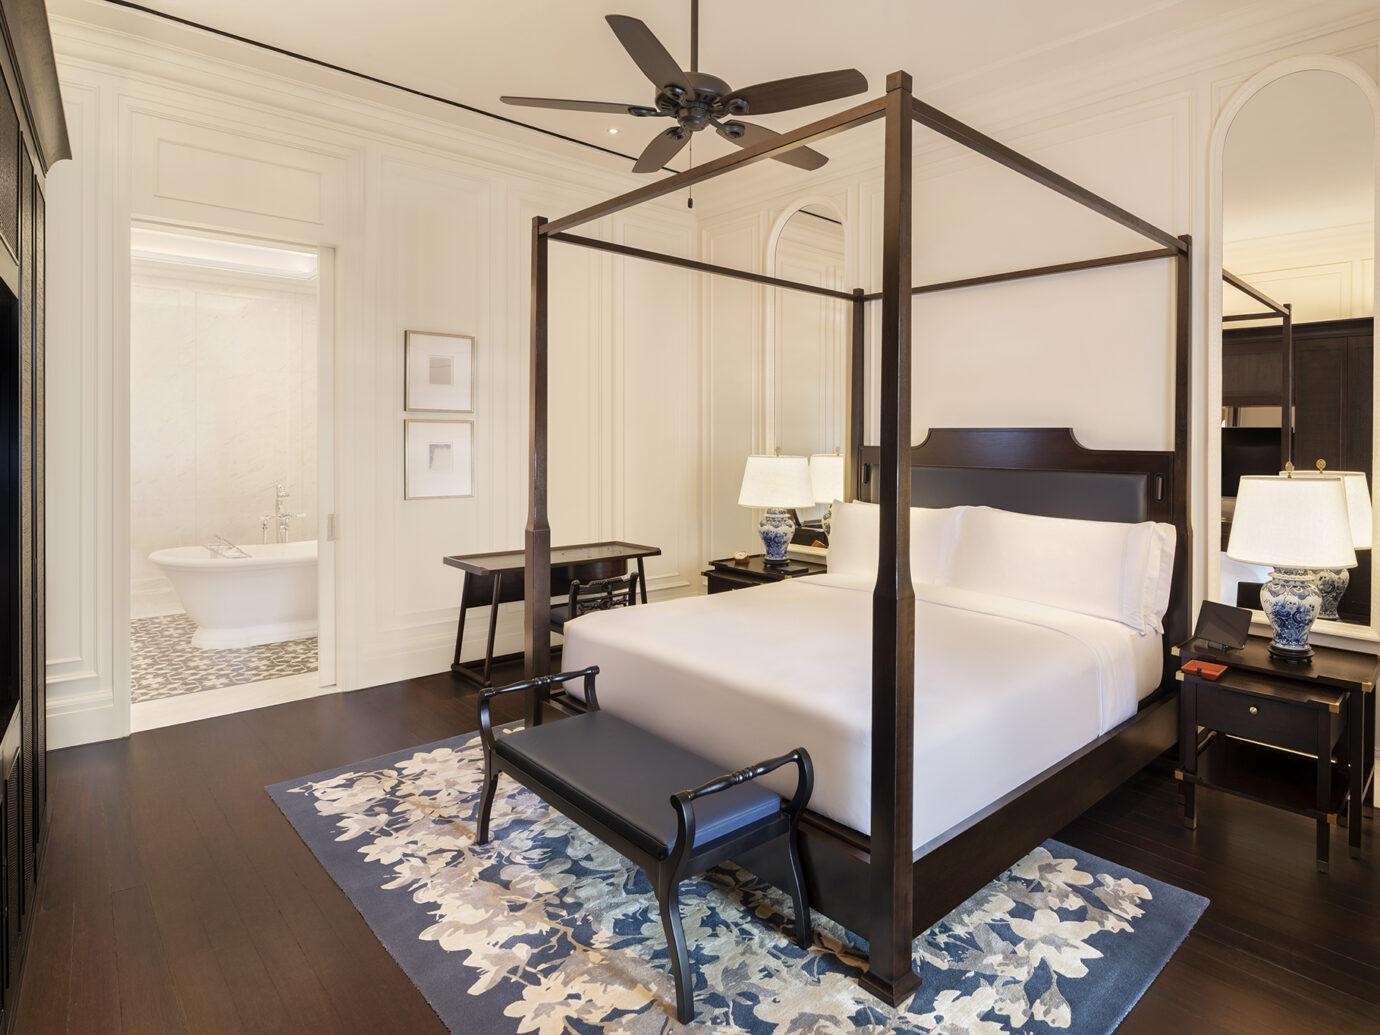 Bedroom at Raffles Singapore